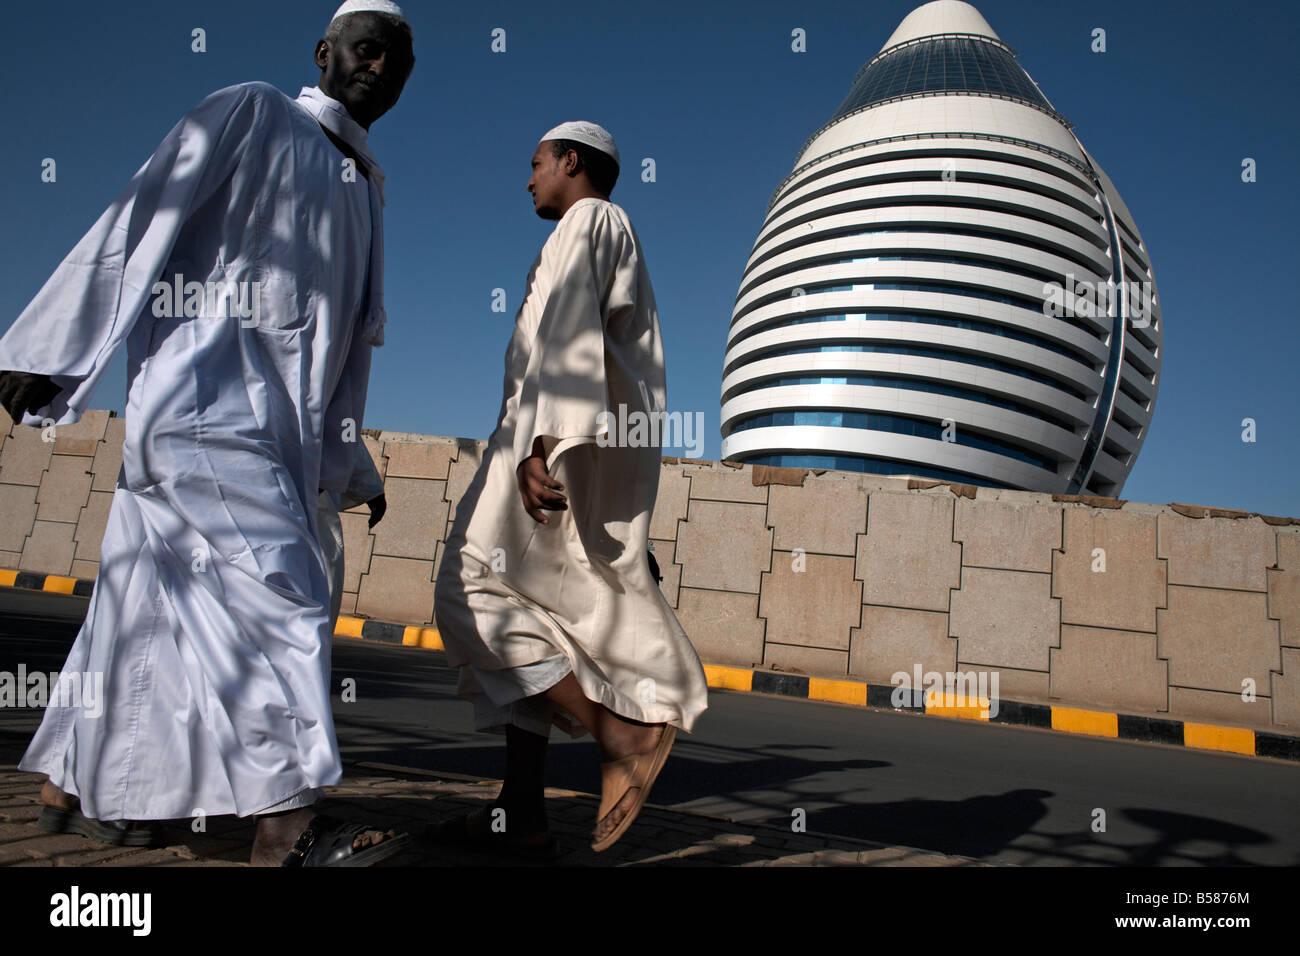 Locals walk past the 5-star Boji Al-Fateh Hotel (Libyan Hotel), designed to represent a sail, Khartoum, Sudan, Africa - Stock Image